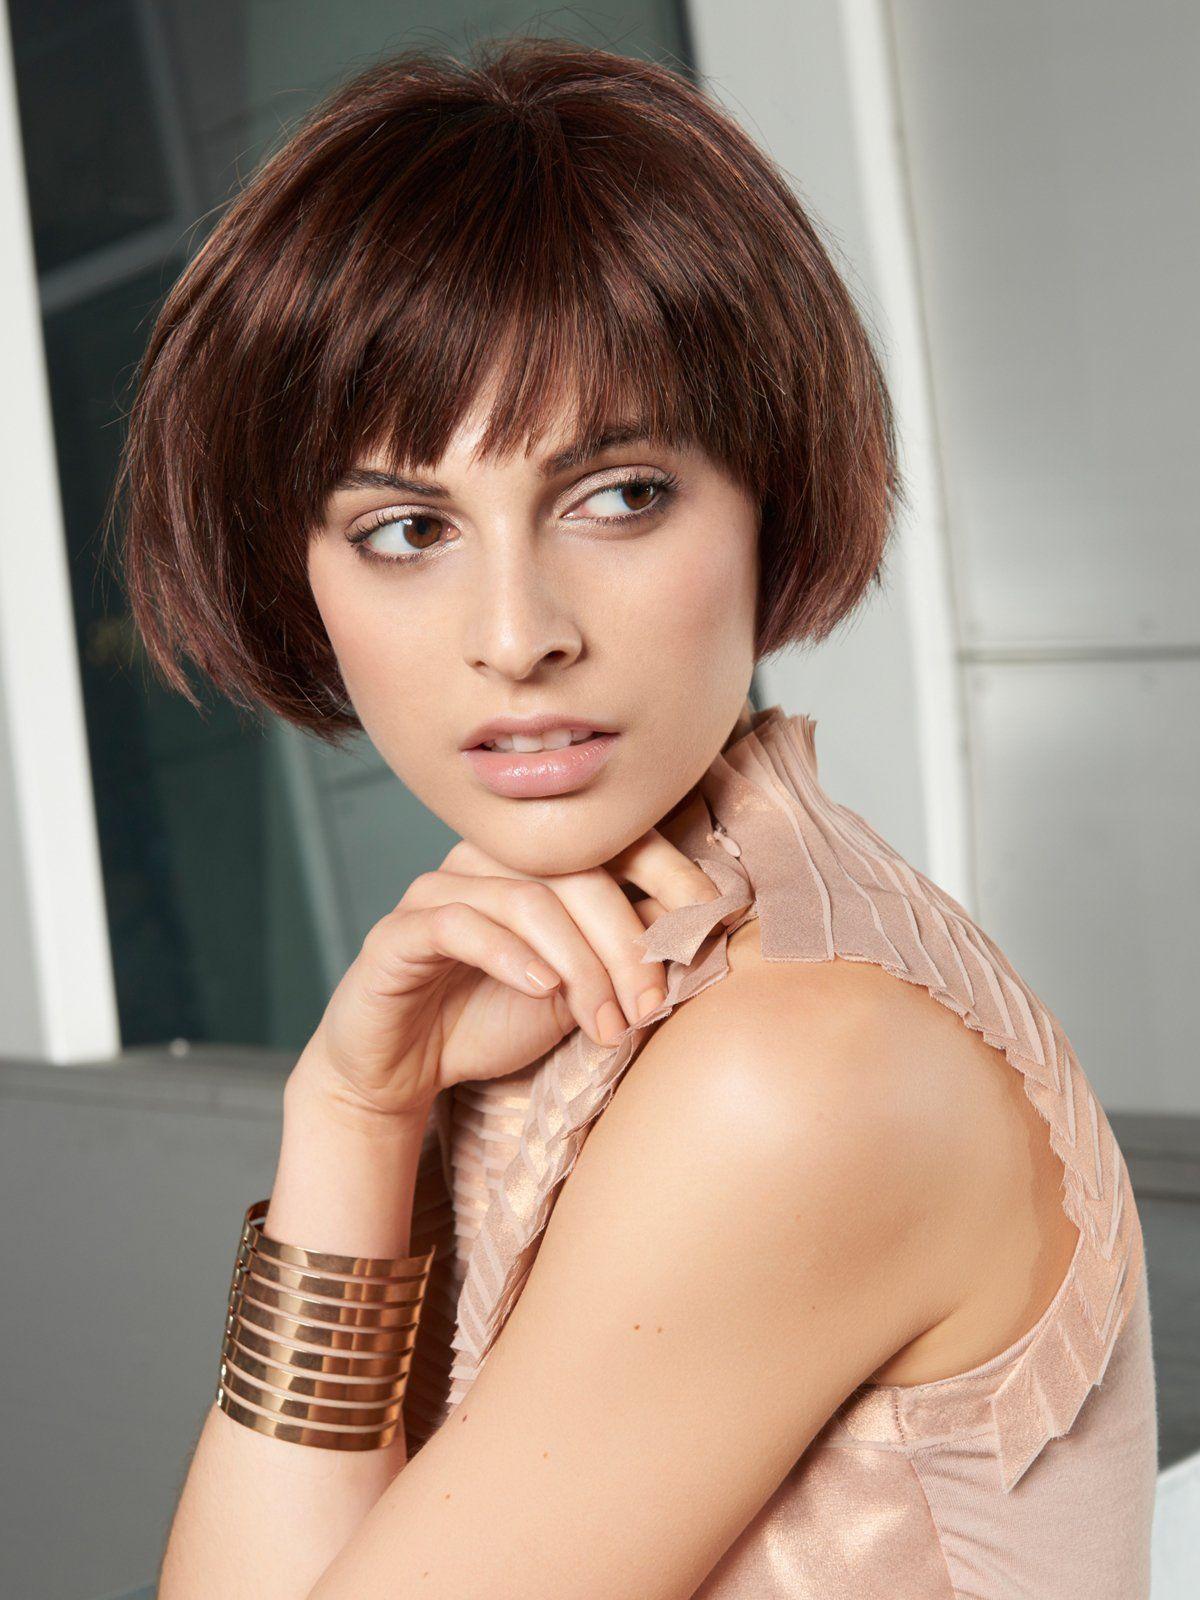 Frisuren 2019 Mittellang Hochgesteckt Pin By Gina Harper On Hair